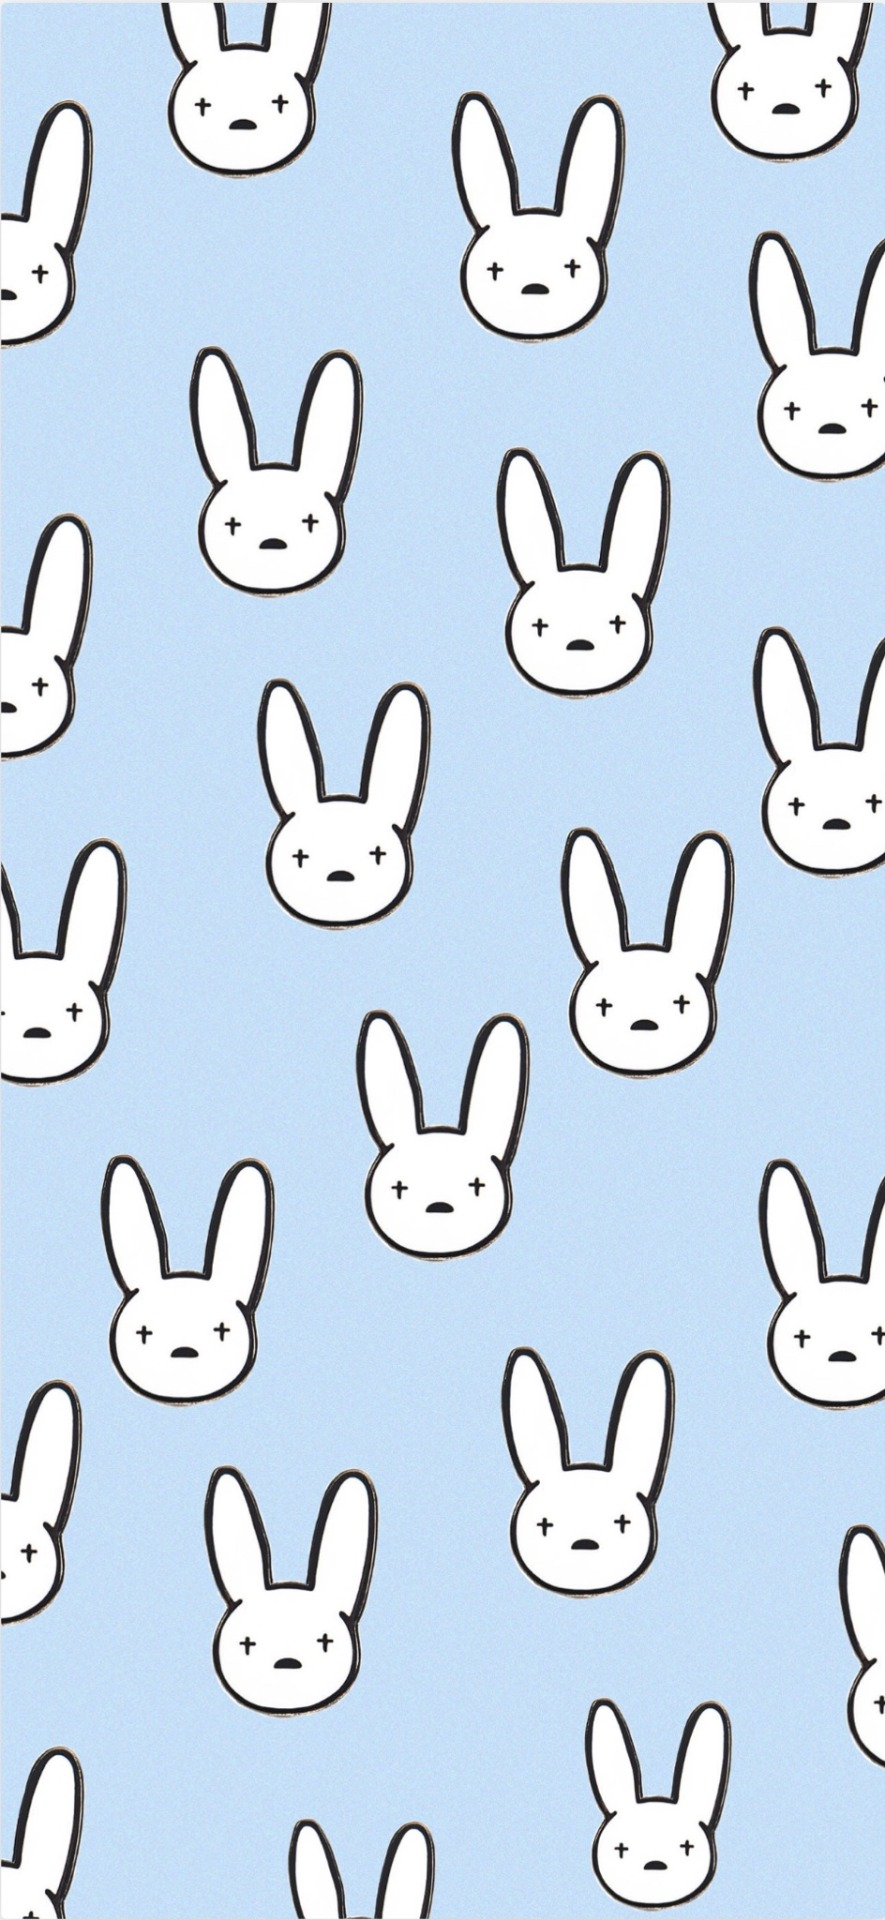 Bad Bunny Logo Wallpaper : bunny, wallpaper, LOCKSCREENS,, BUNNY, REQUESTED, Don't, Any...